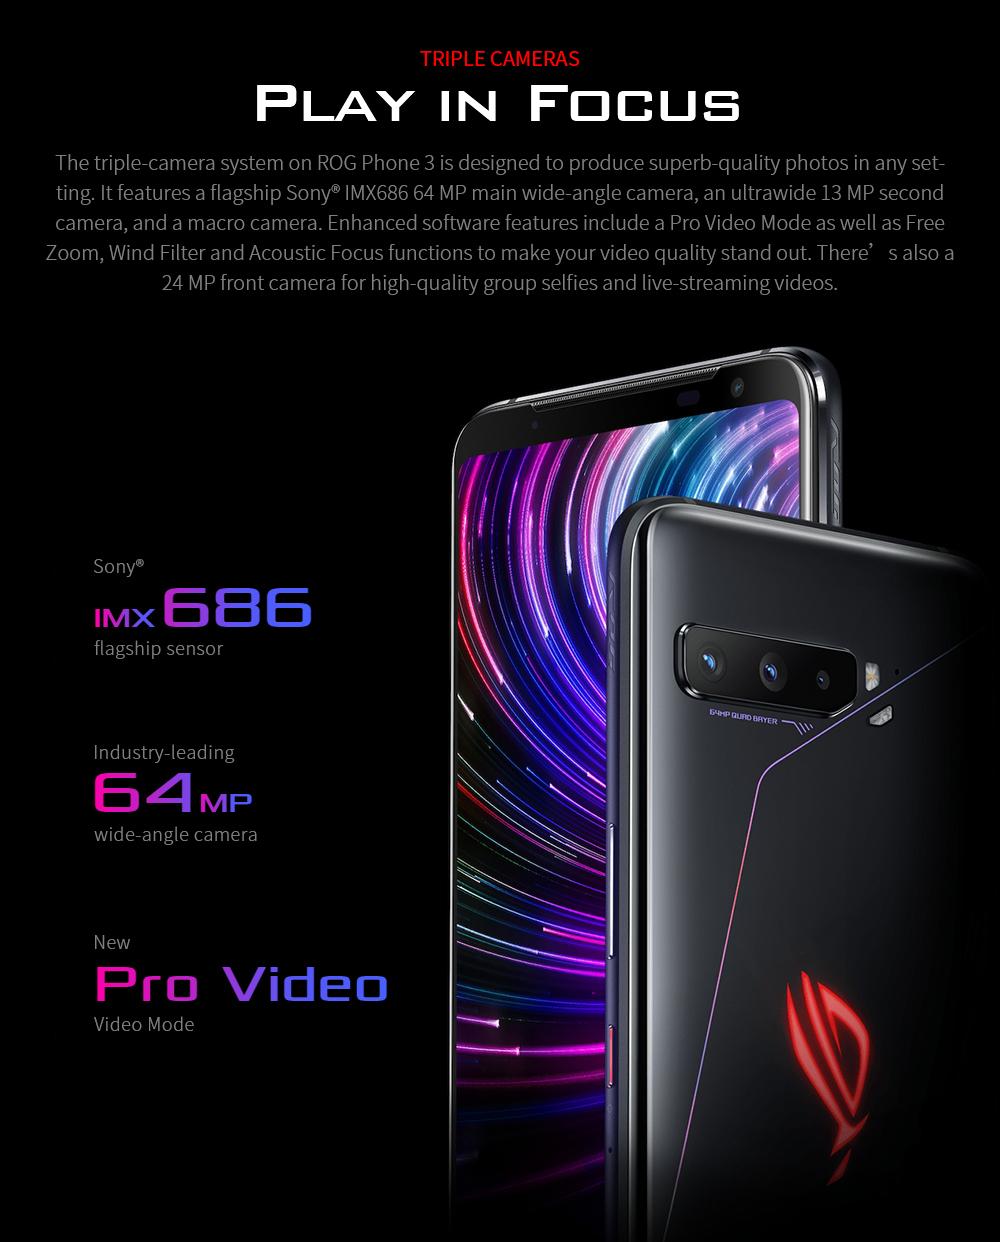 ASUS ROG Phone 3 Gaming 5G Smartphone TRIPLE CAMERAS